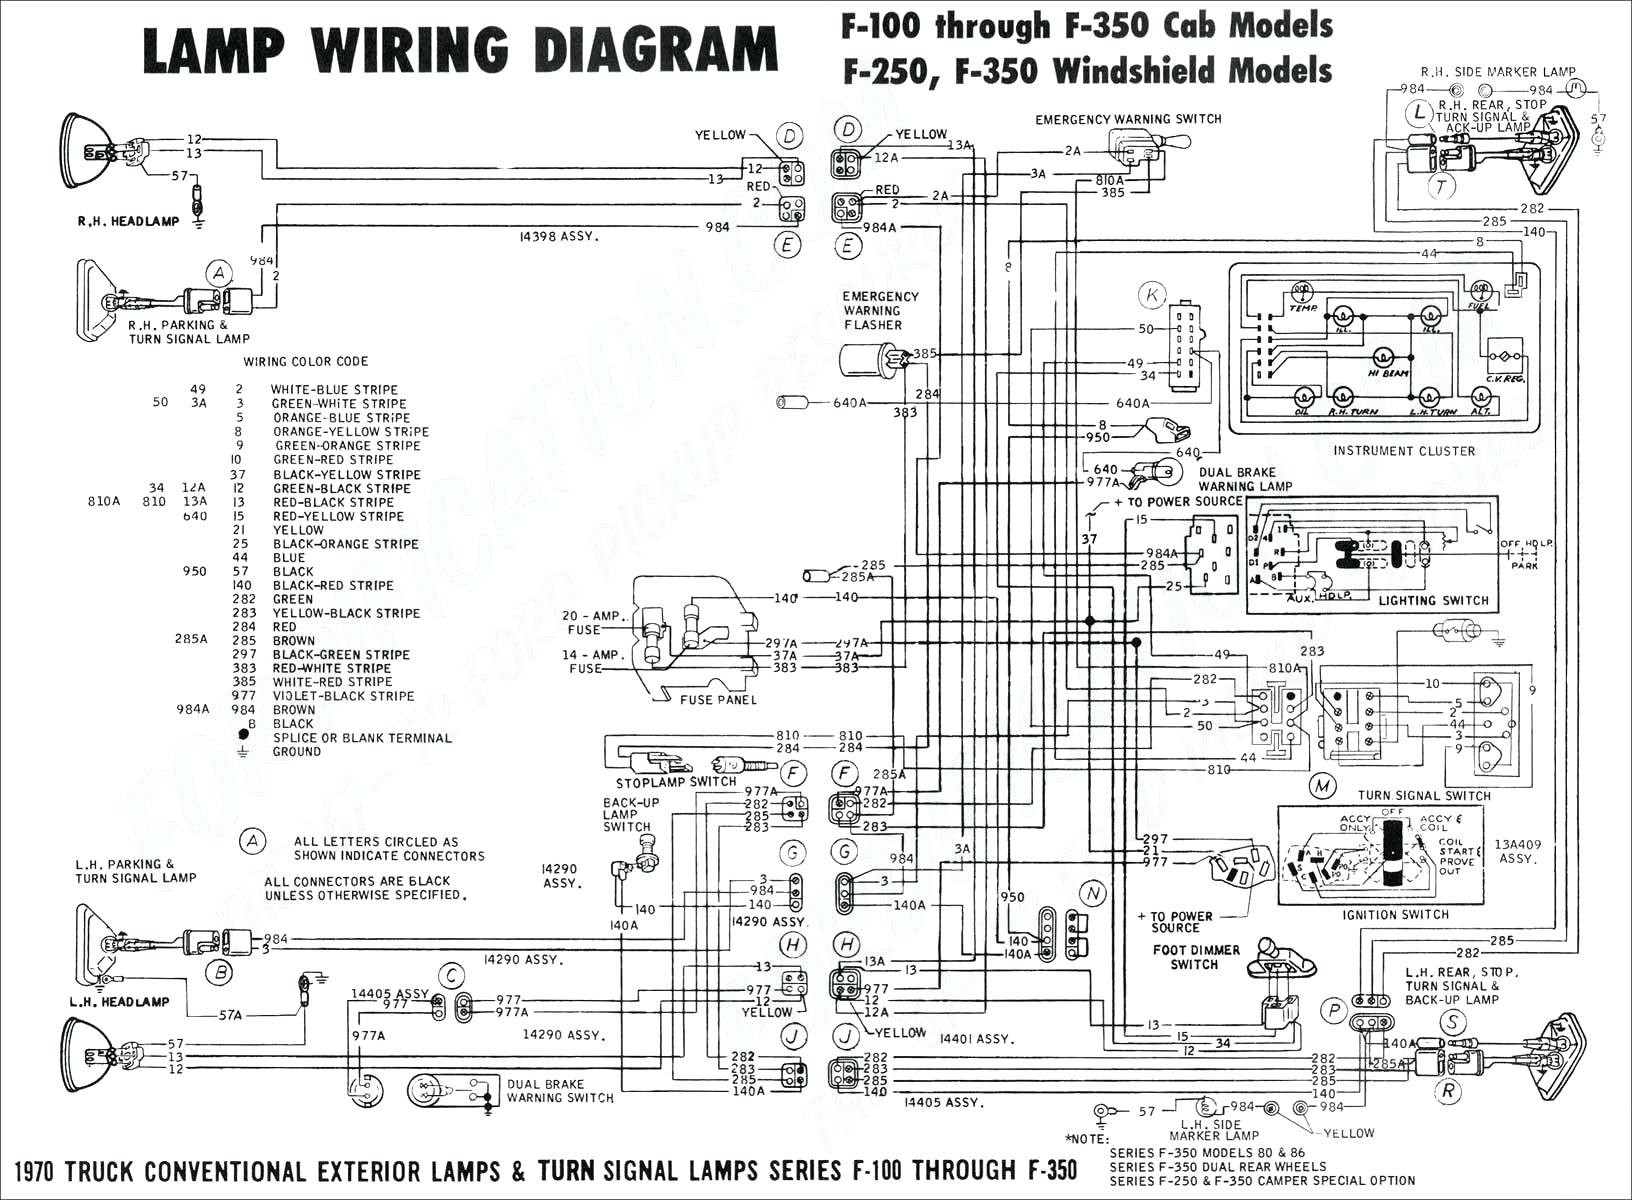 2000 f250 headlight switch wiring diagram wiring diagram au falcon fresh stop turn tail light wiring diagram beautiful 1979 ford f150 tail 17t?quality\\\\\\\=80\\\\\\\&strip\\\\\\\=all bazooka 9022 wiring diagram wiring diagram blog data